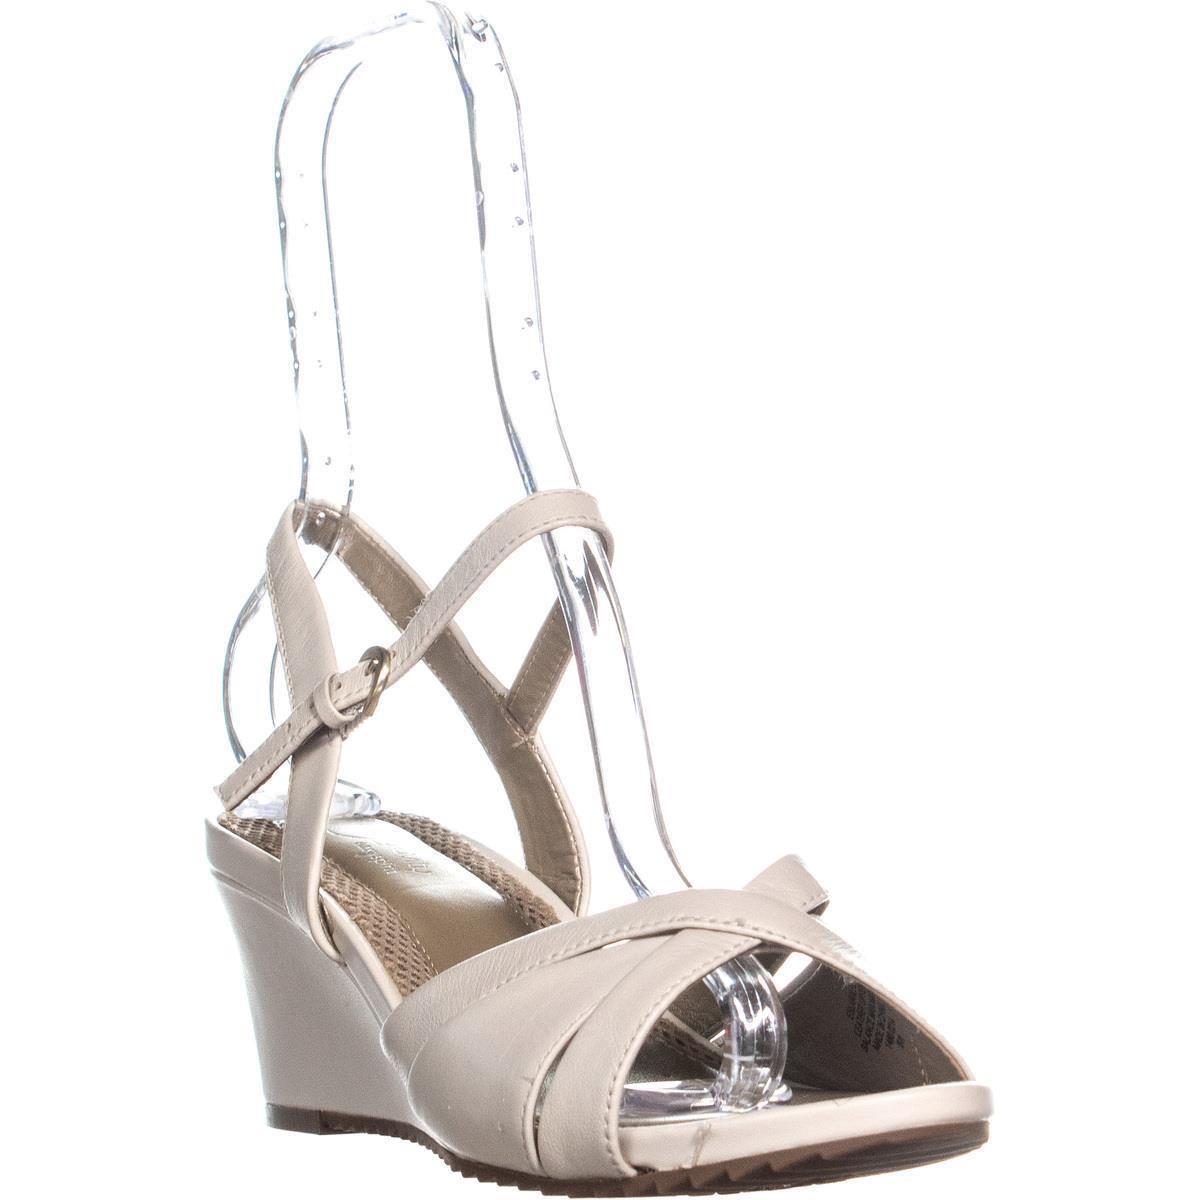 db6e3c602543 Lyst - Easy Spirit Laralee Peep Toe Ankle Strap Wedge Sandals